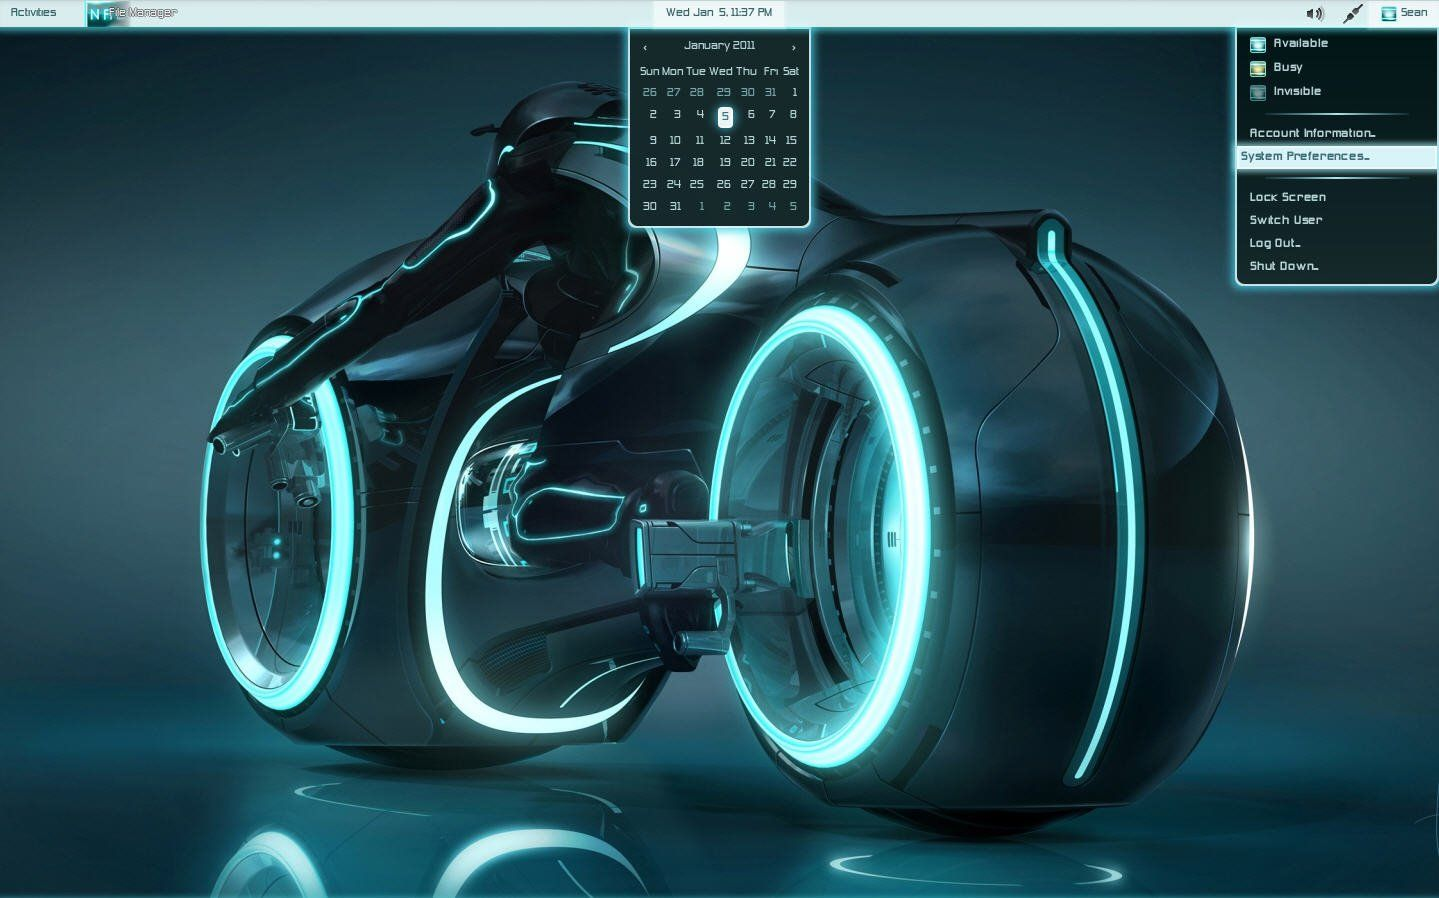 Tron-Legacy-GNOME-Shell-2